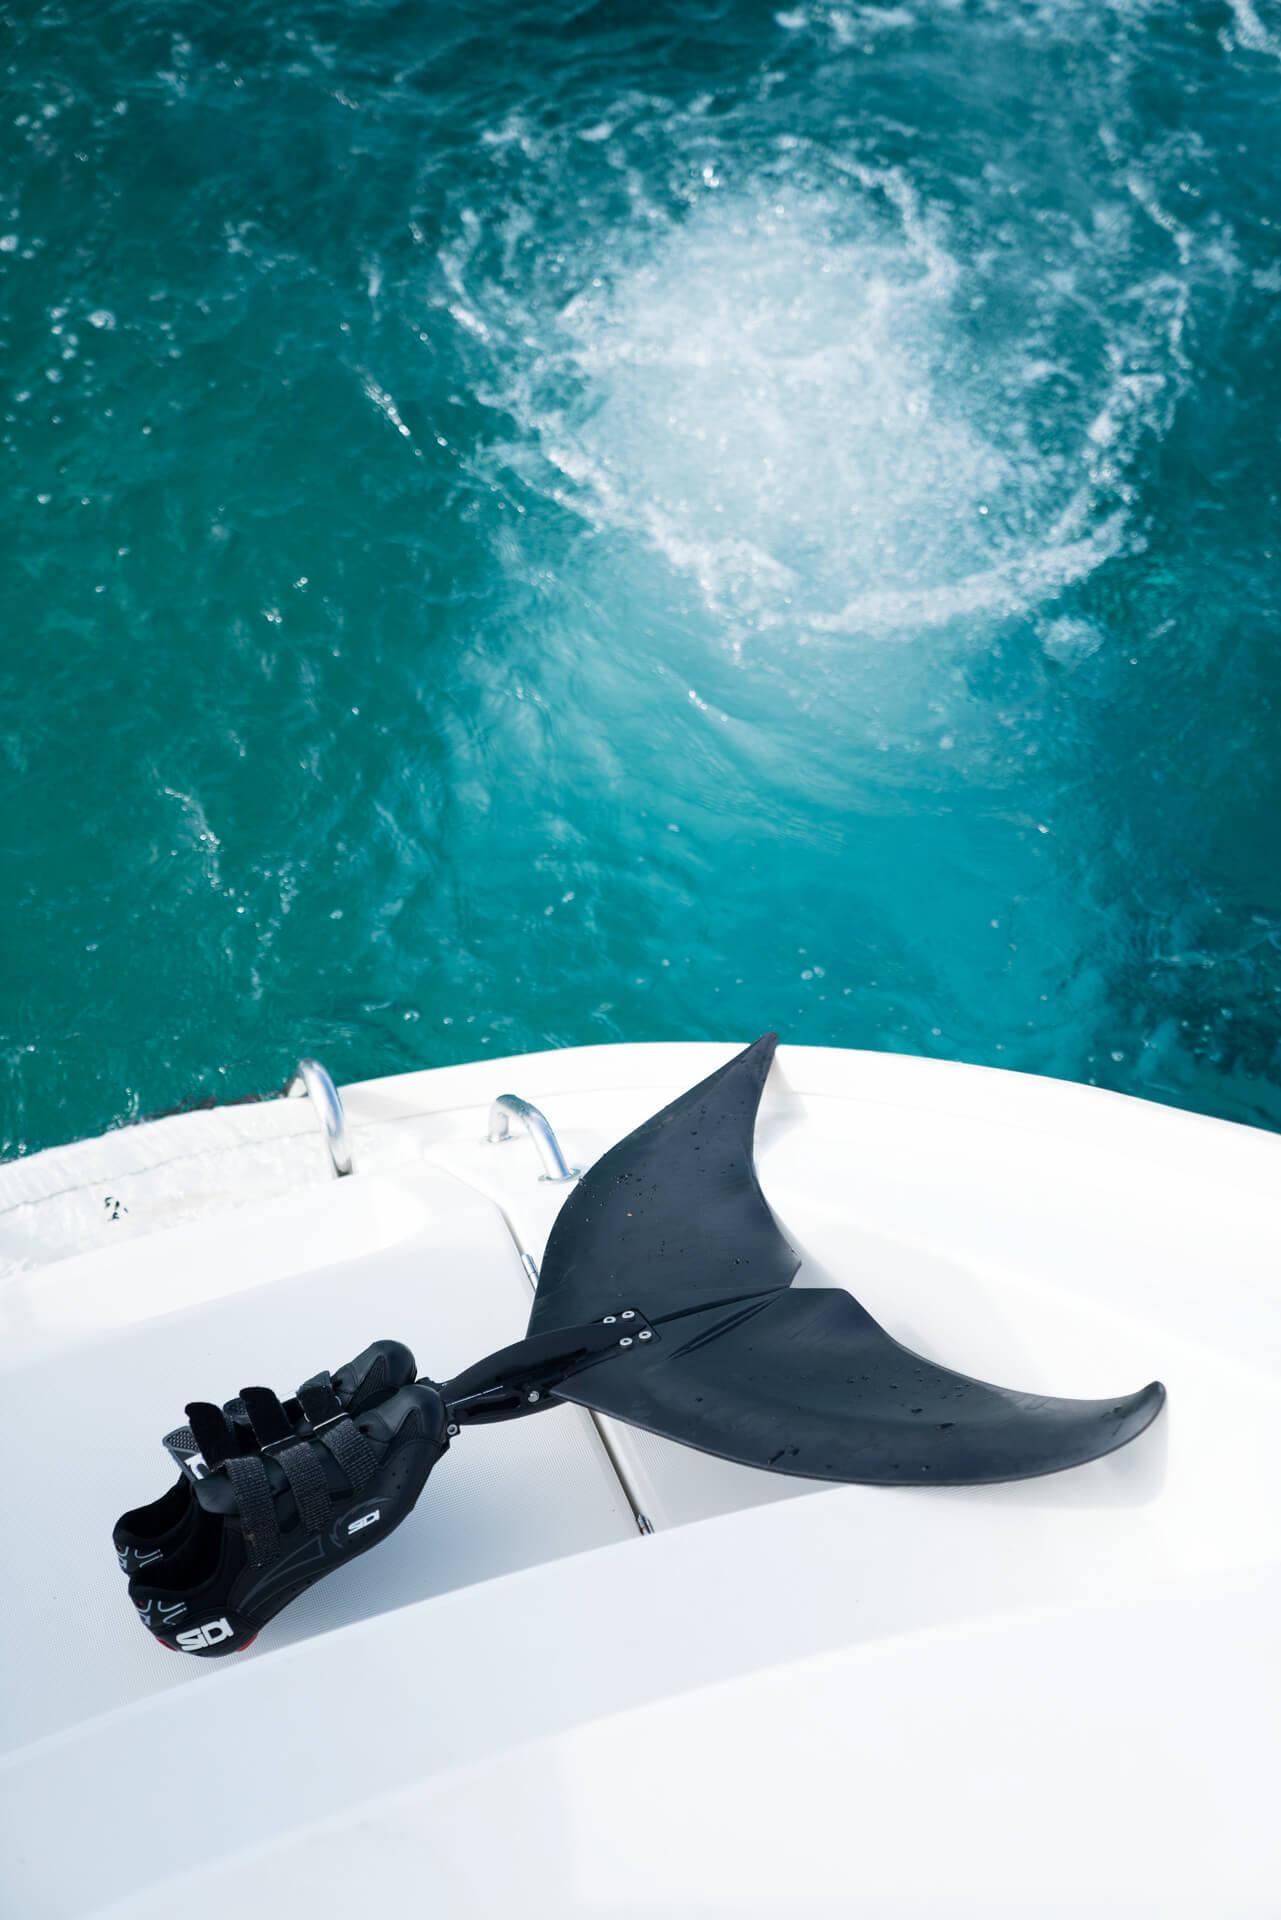 monofin atop a boat